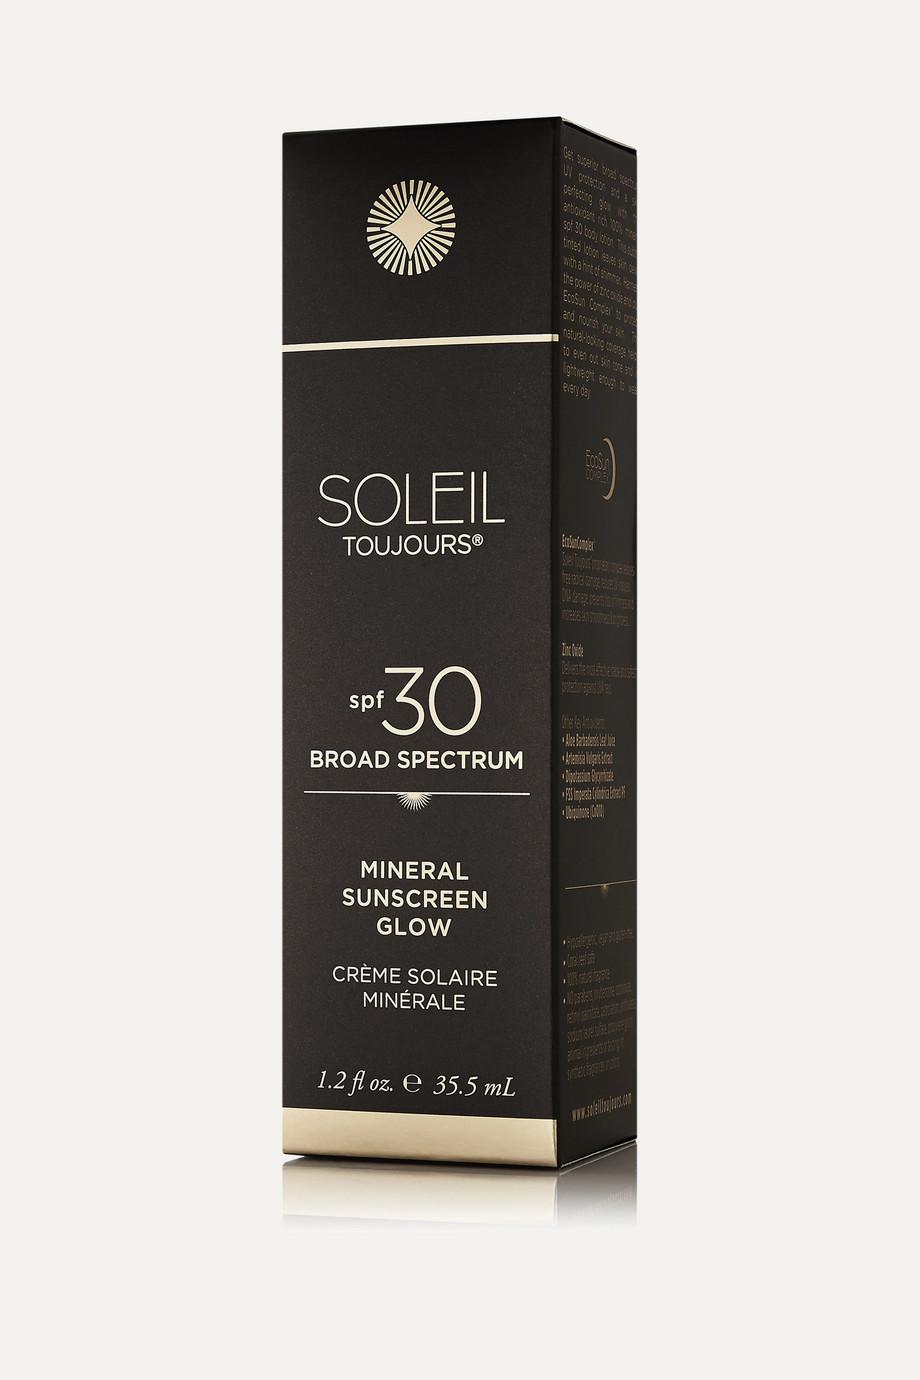 Soleil Toujours + NET SUSTAIN SPF30 Mineral Sunscreen Glow, 94.5ml